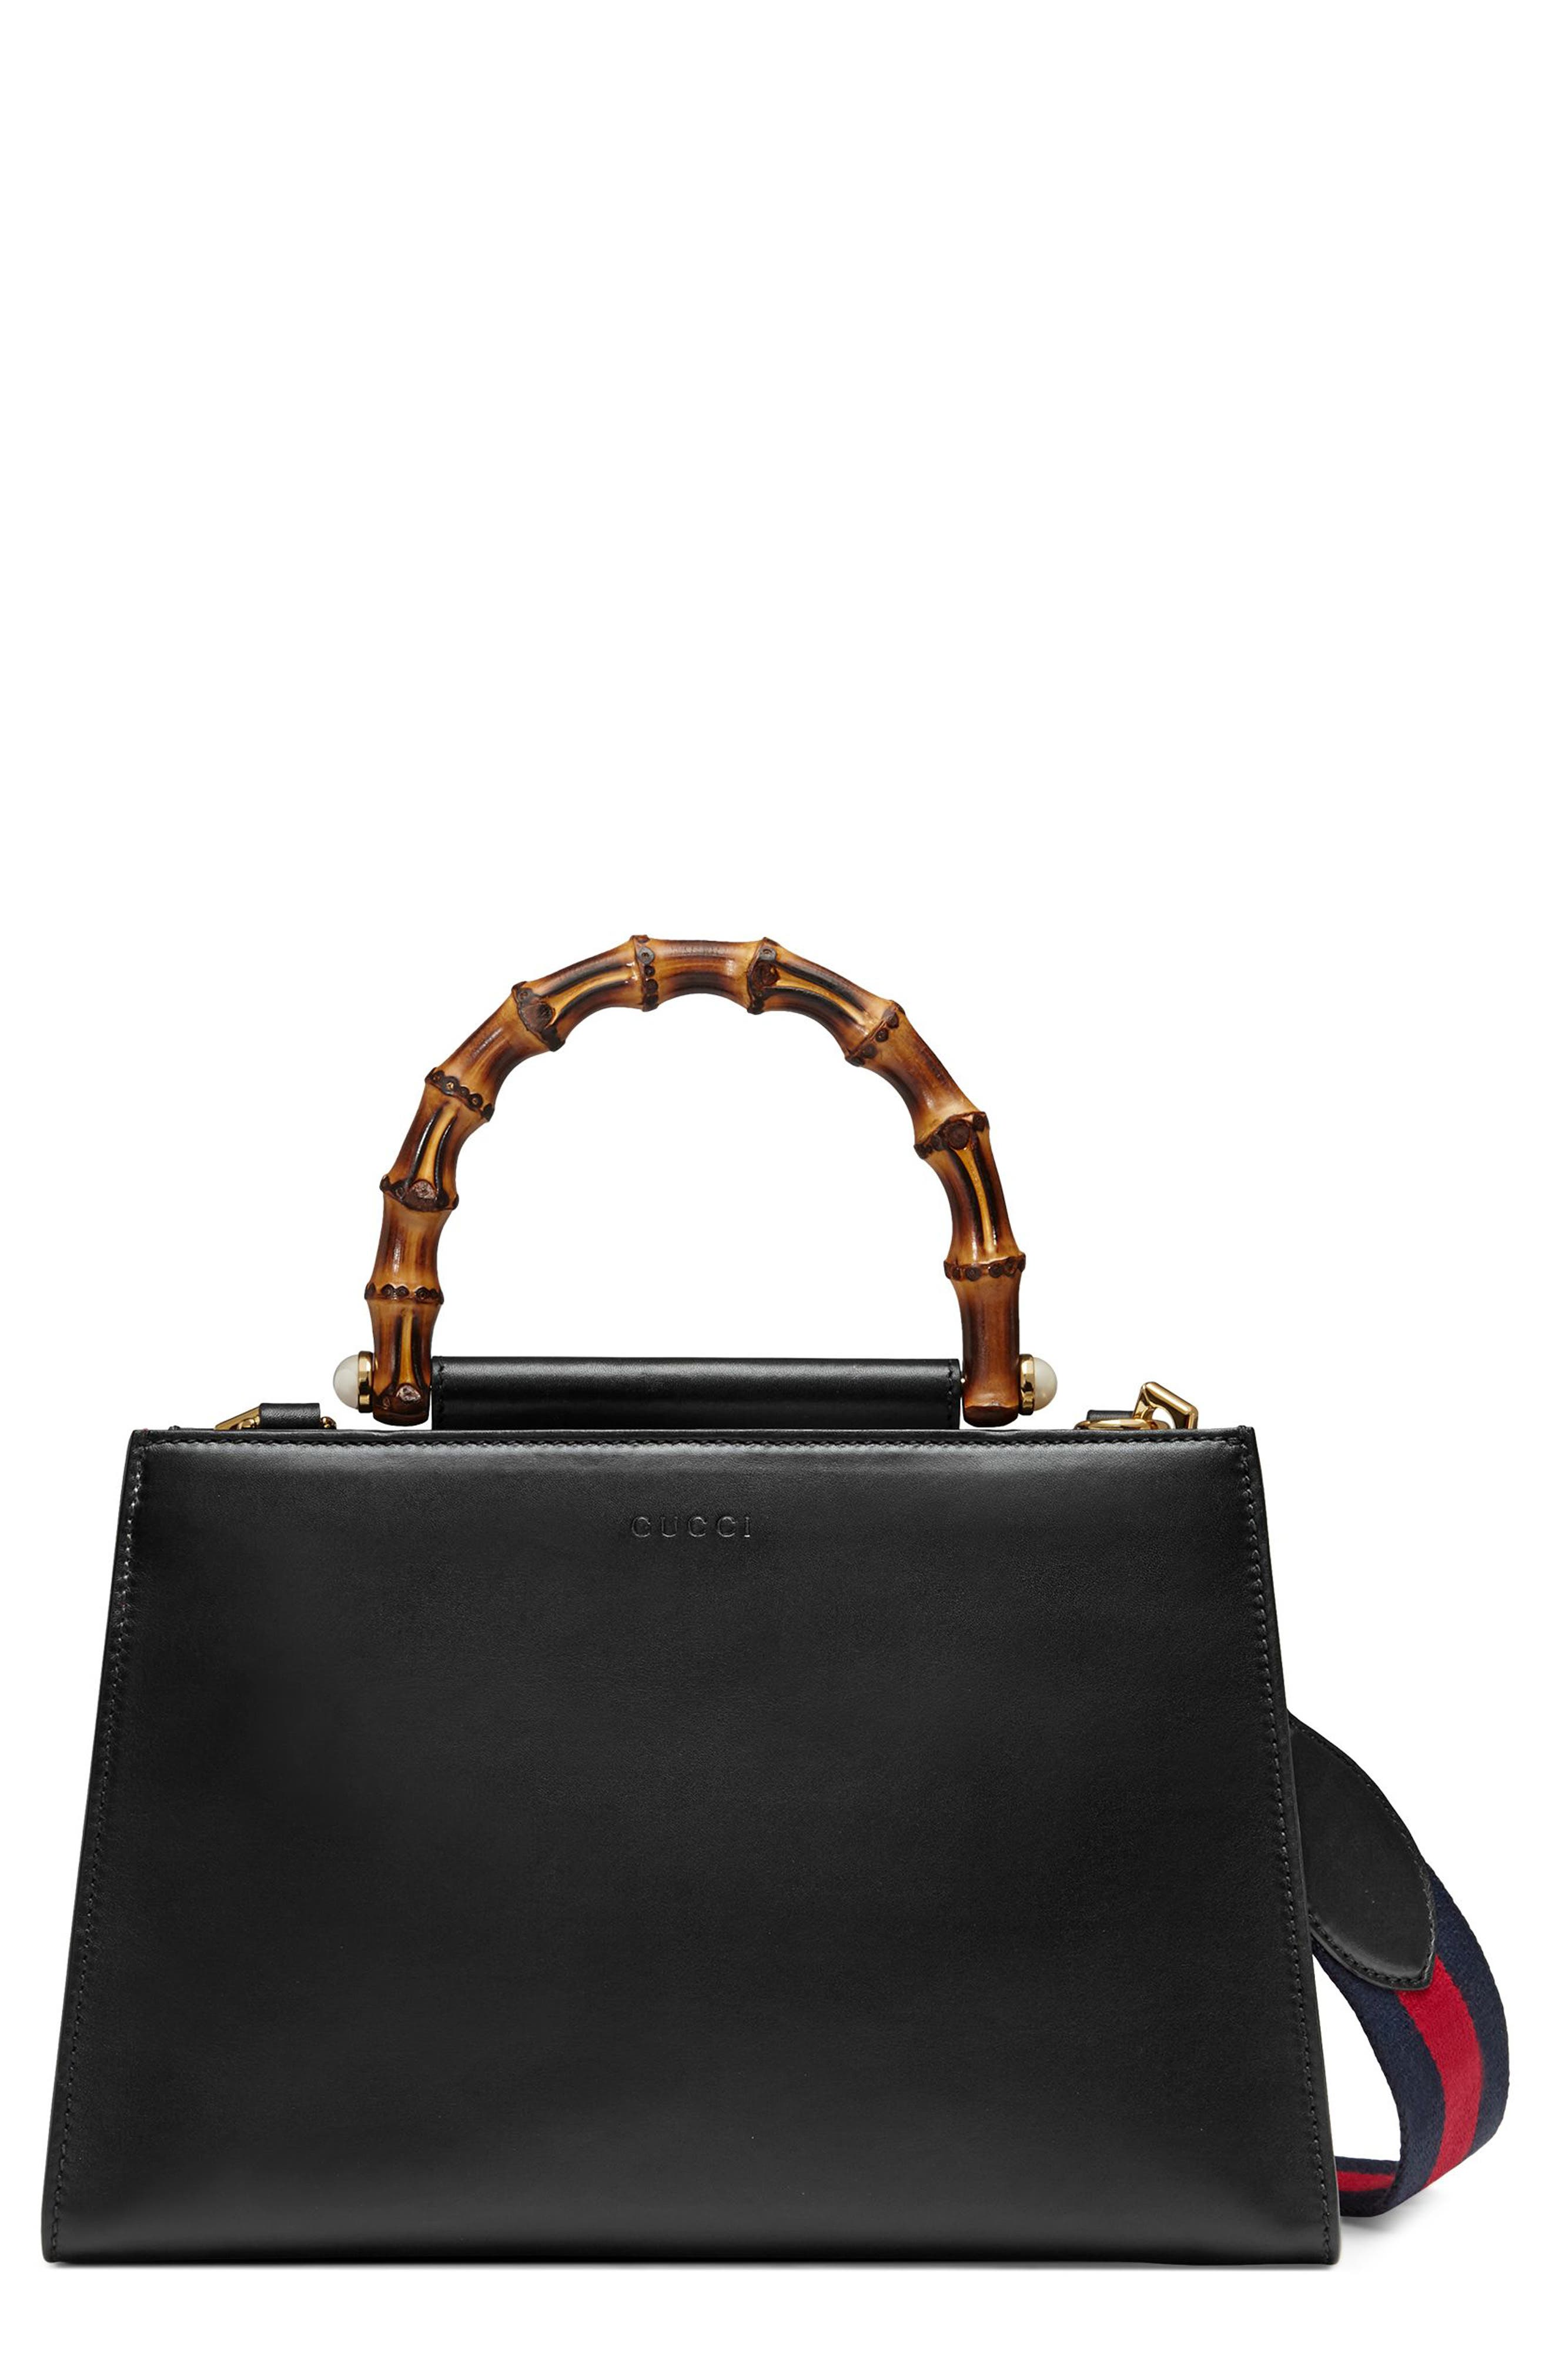 Main Image - Gucci Medium Nymphea Bicolor Leather Top Handle Satchel